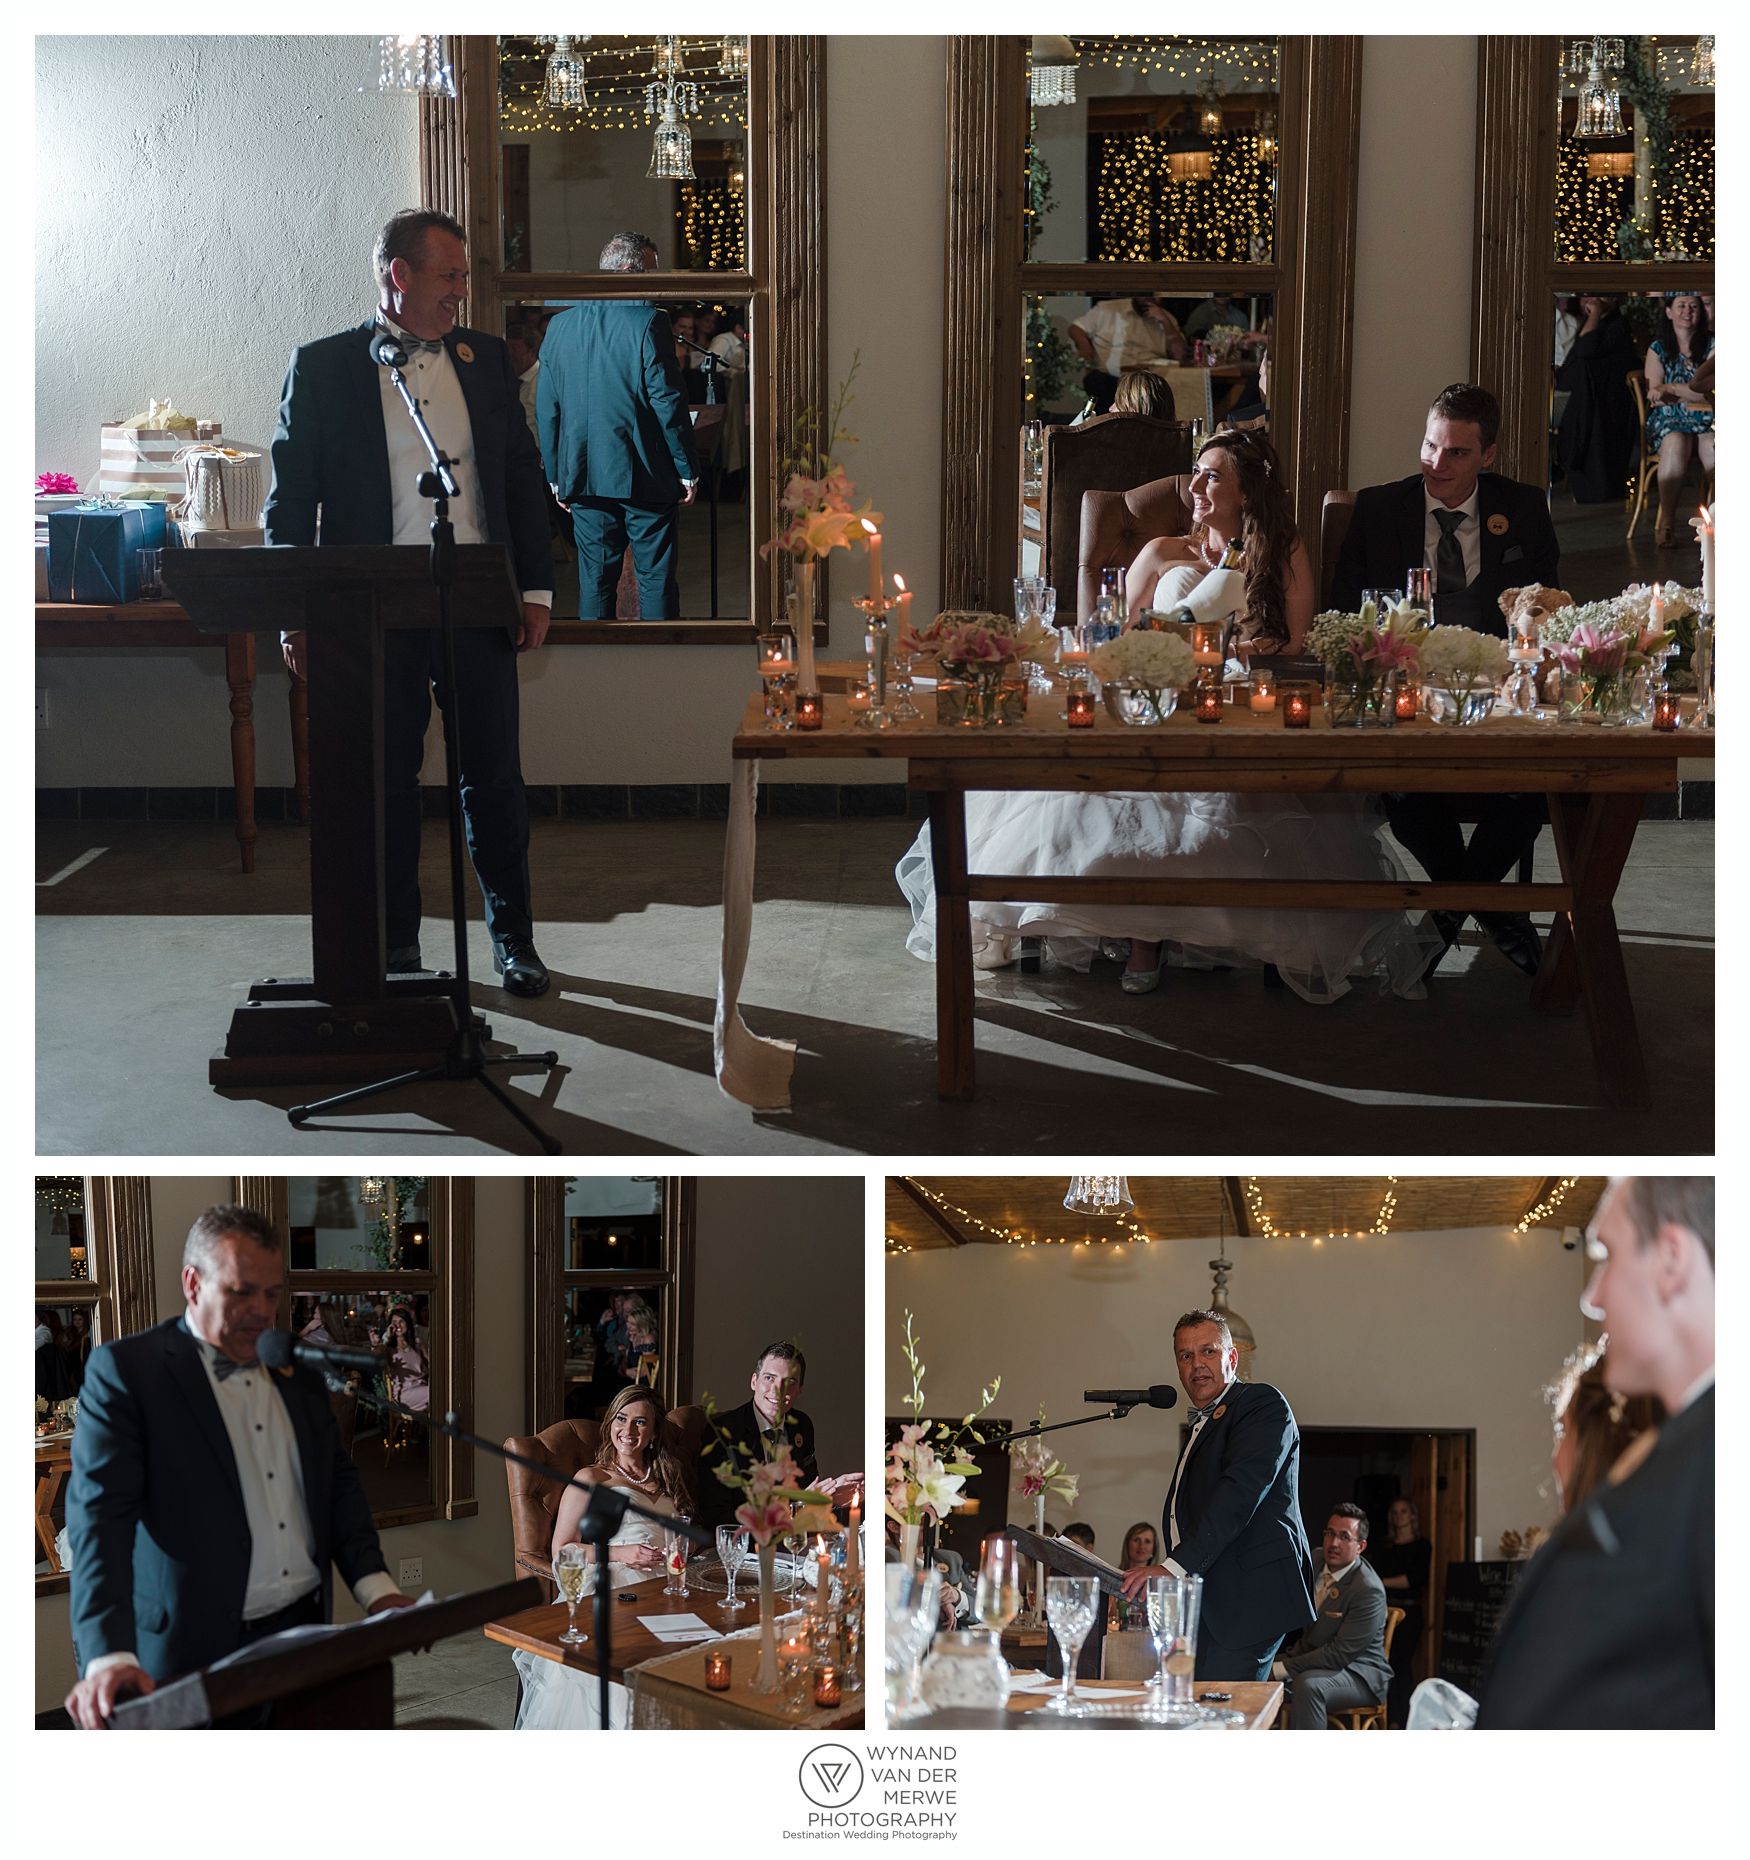 Wynandvandermerwe ryan natalia wedding photography cradle valley guesthouse gauteng-617.jpg